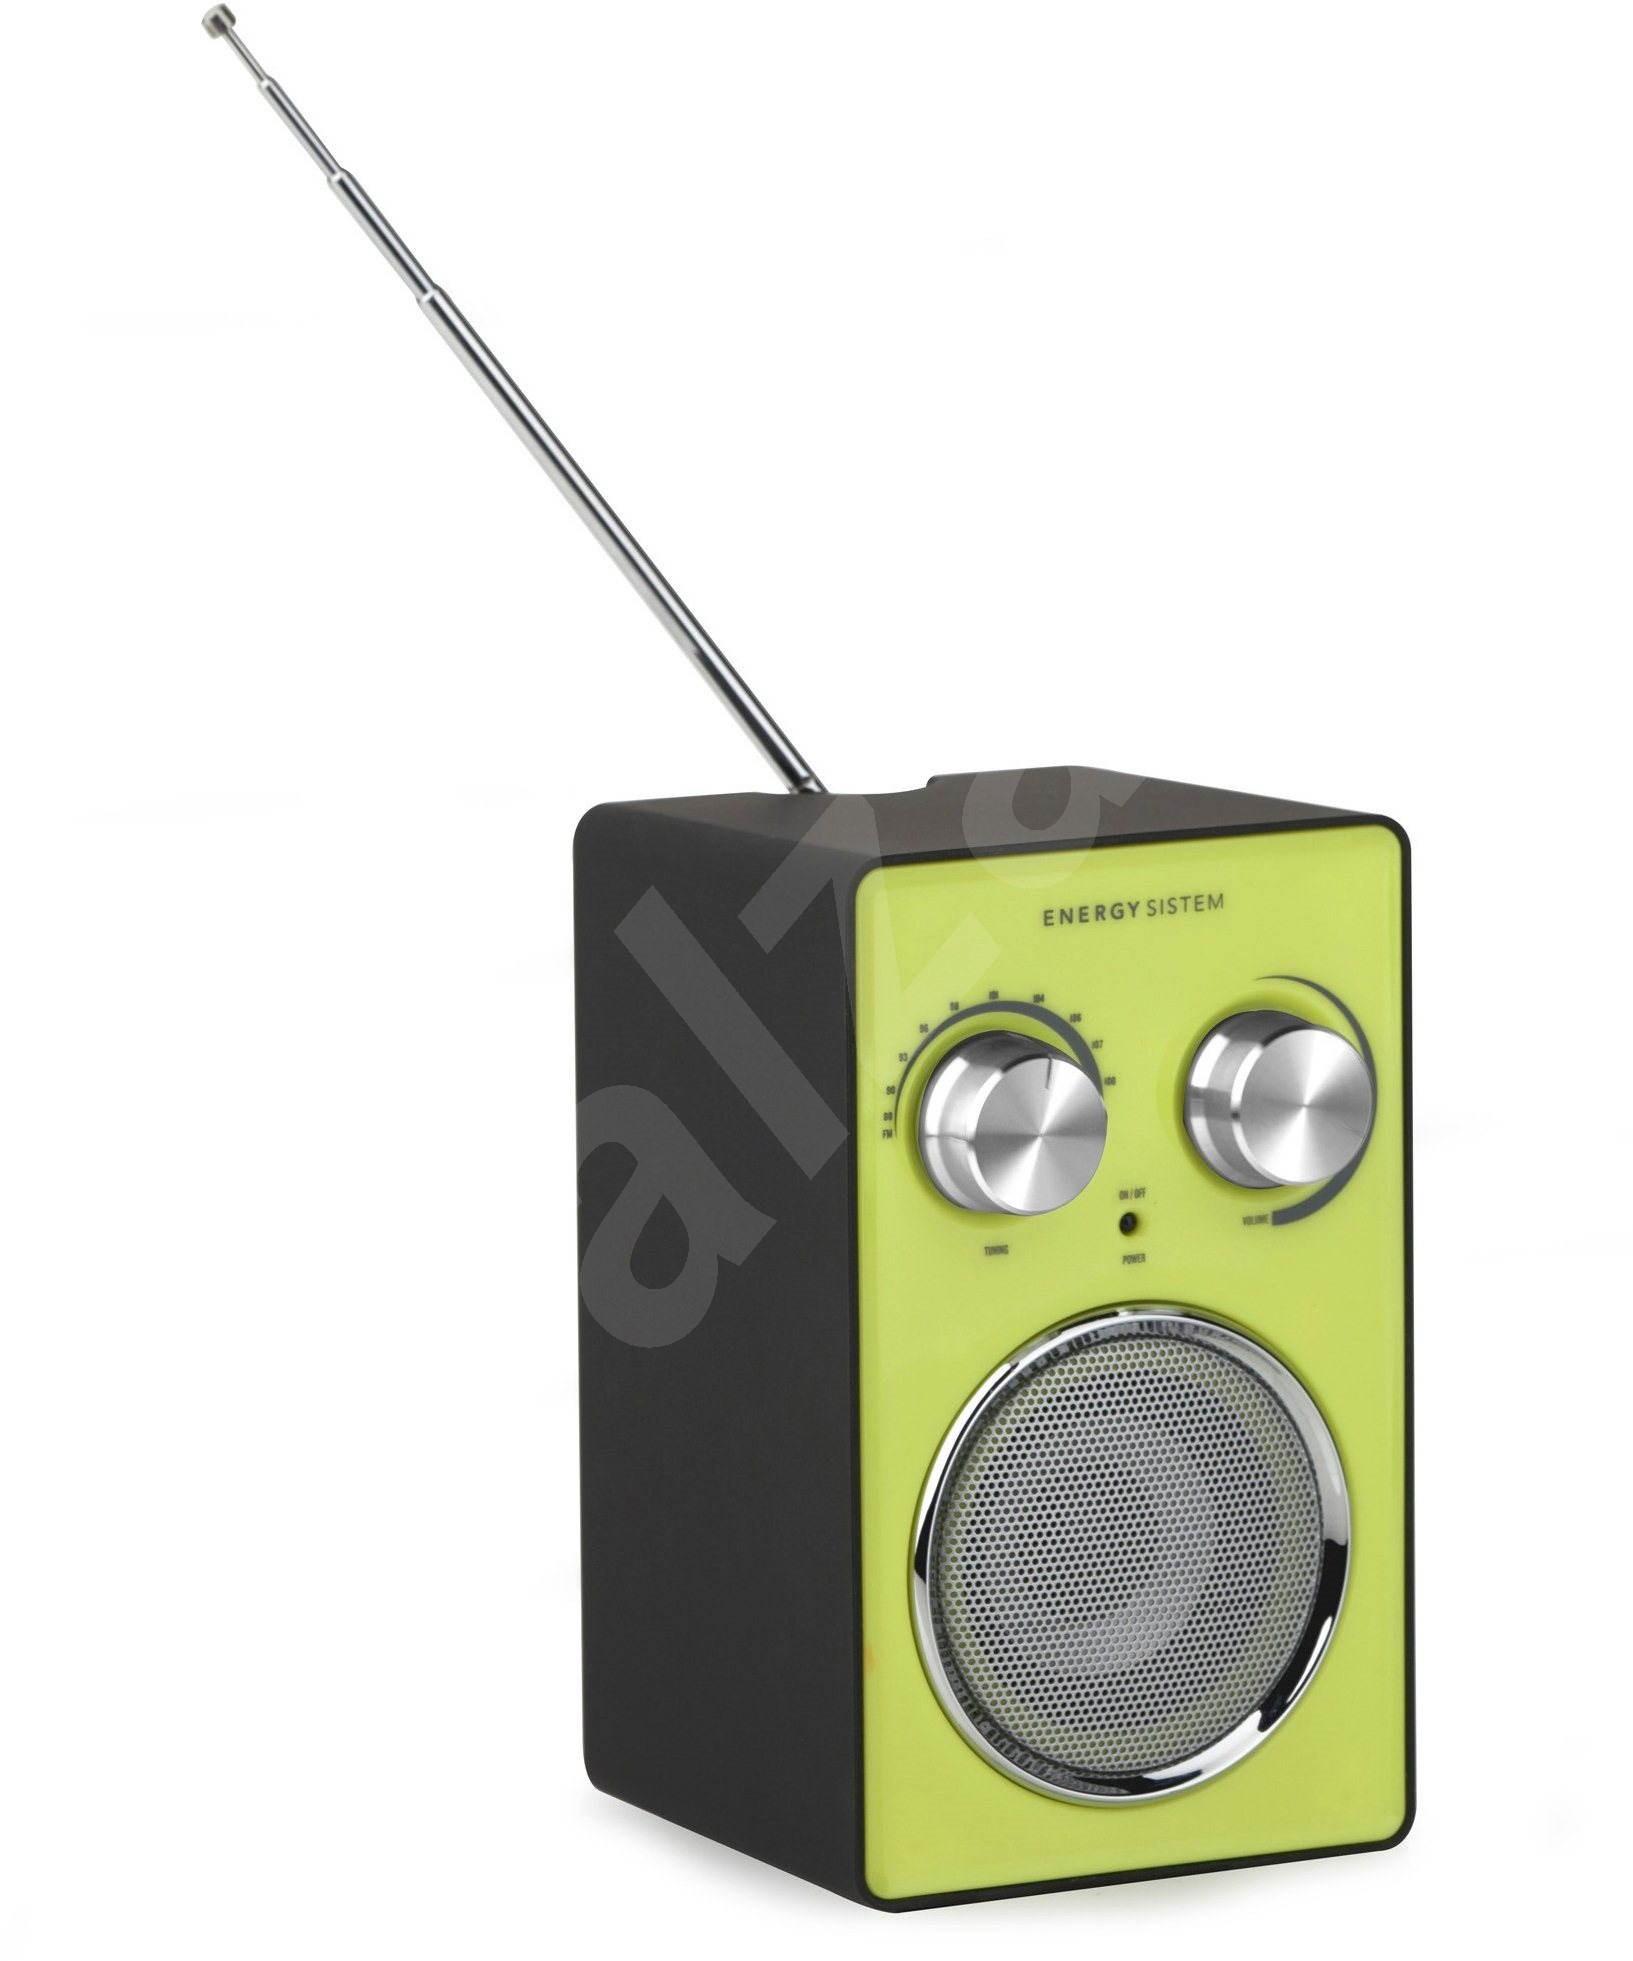 Energy Sistem Fm Radio 210 Black Green Alzashop Com